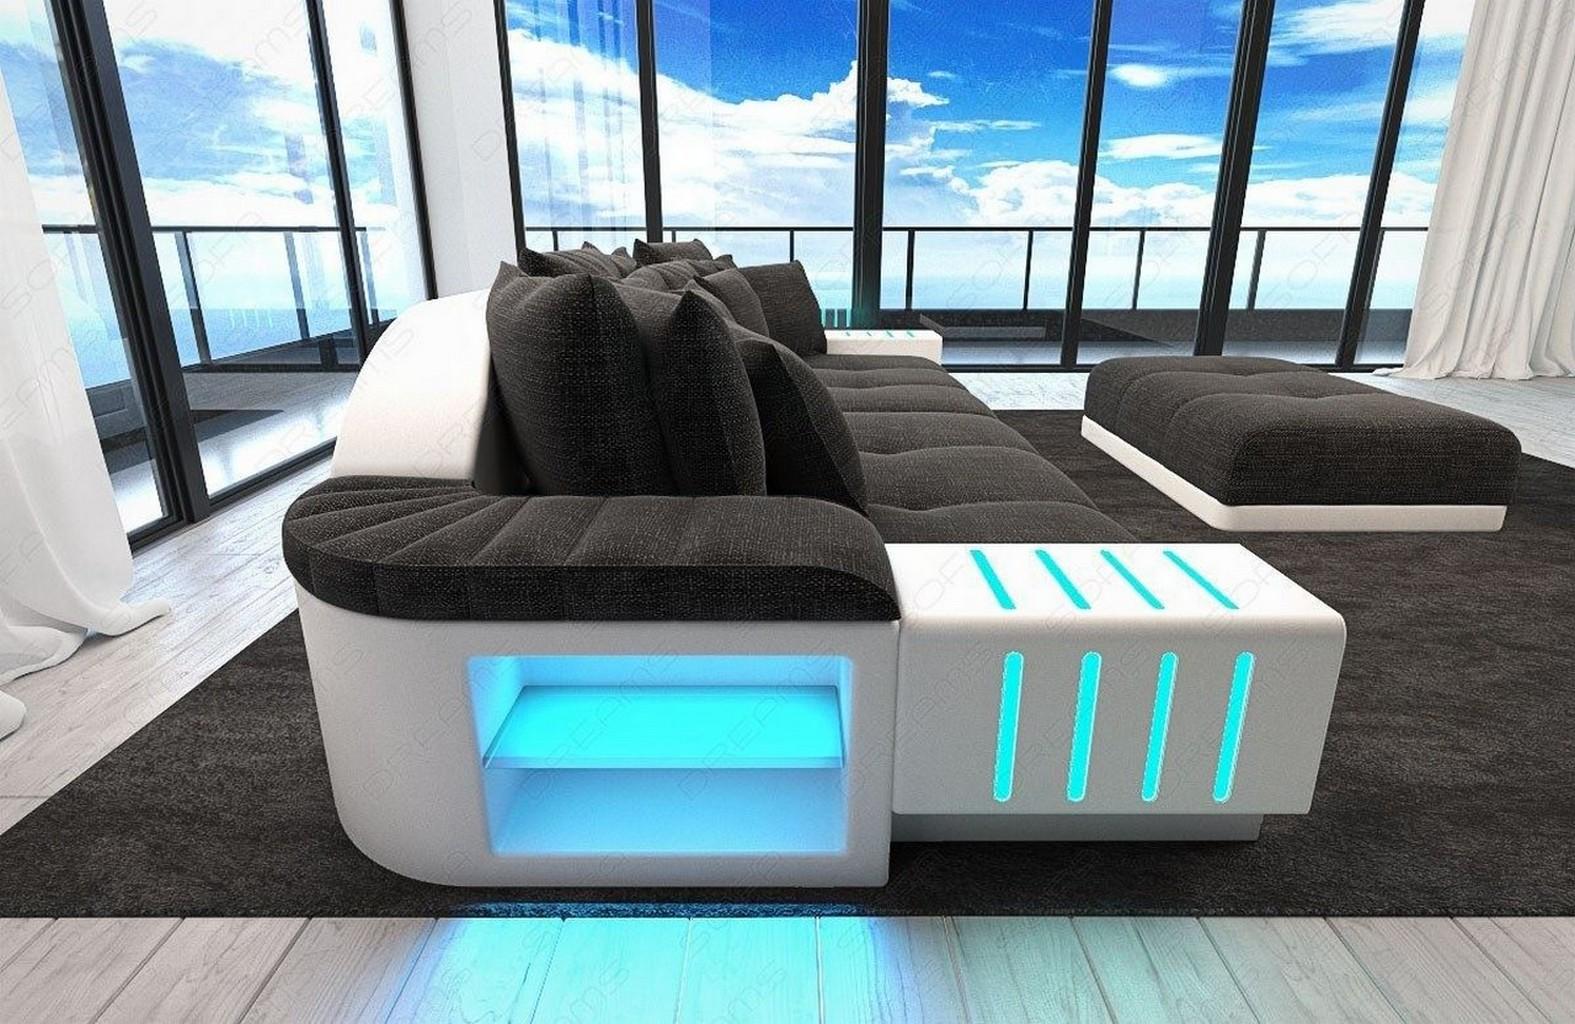 Megasofa xxl big sofa stoffcouch designer couchgarnitur bellagio led beleuchtung ebay - Couchgarnitur xxl ...